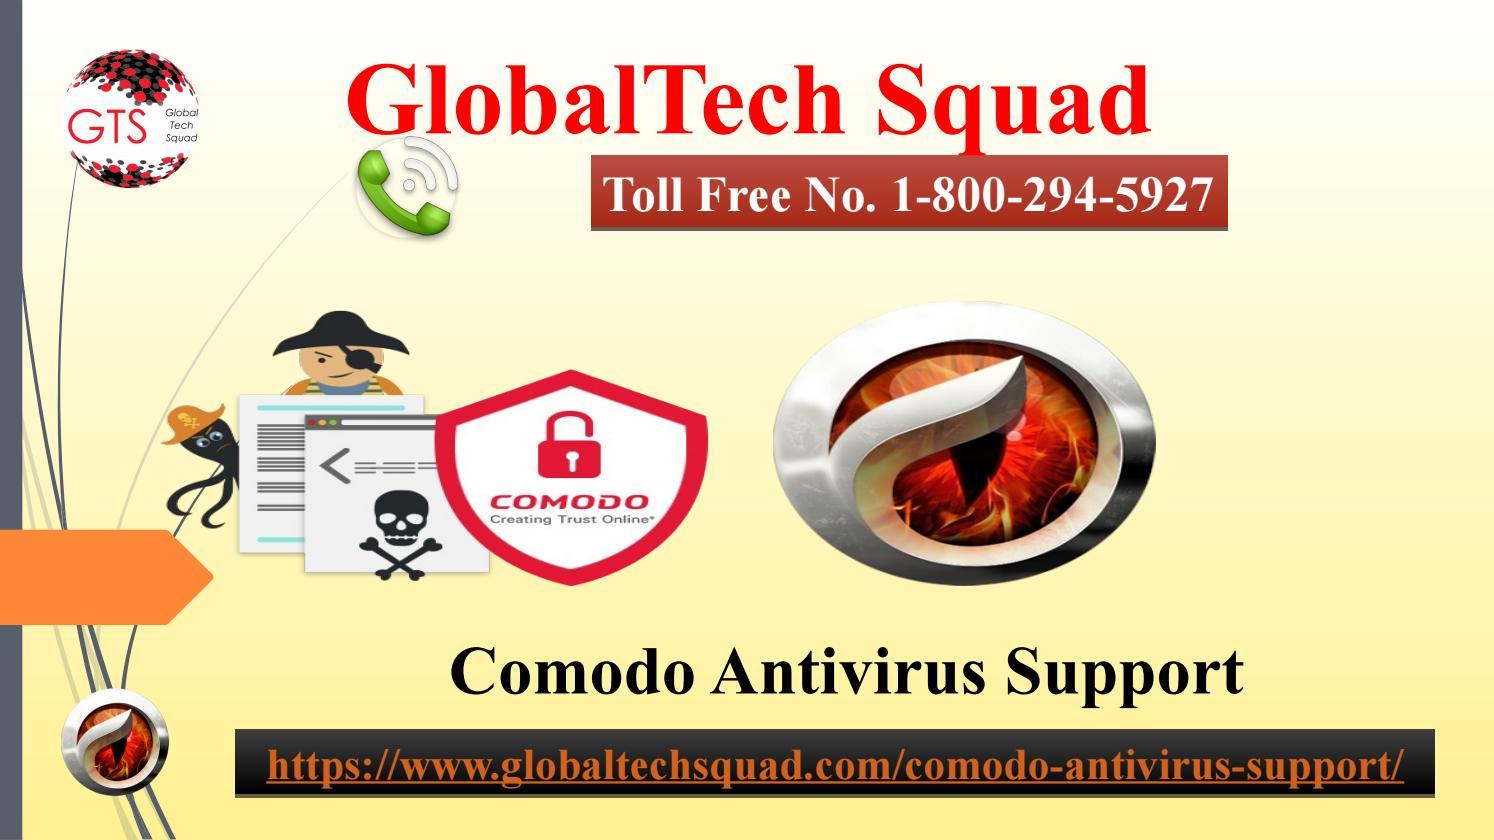 Comodo Antivirus Support | Toll Free Number 1-800-294-5907